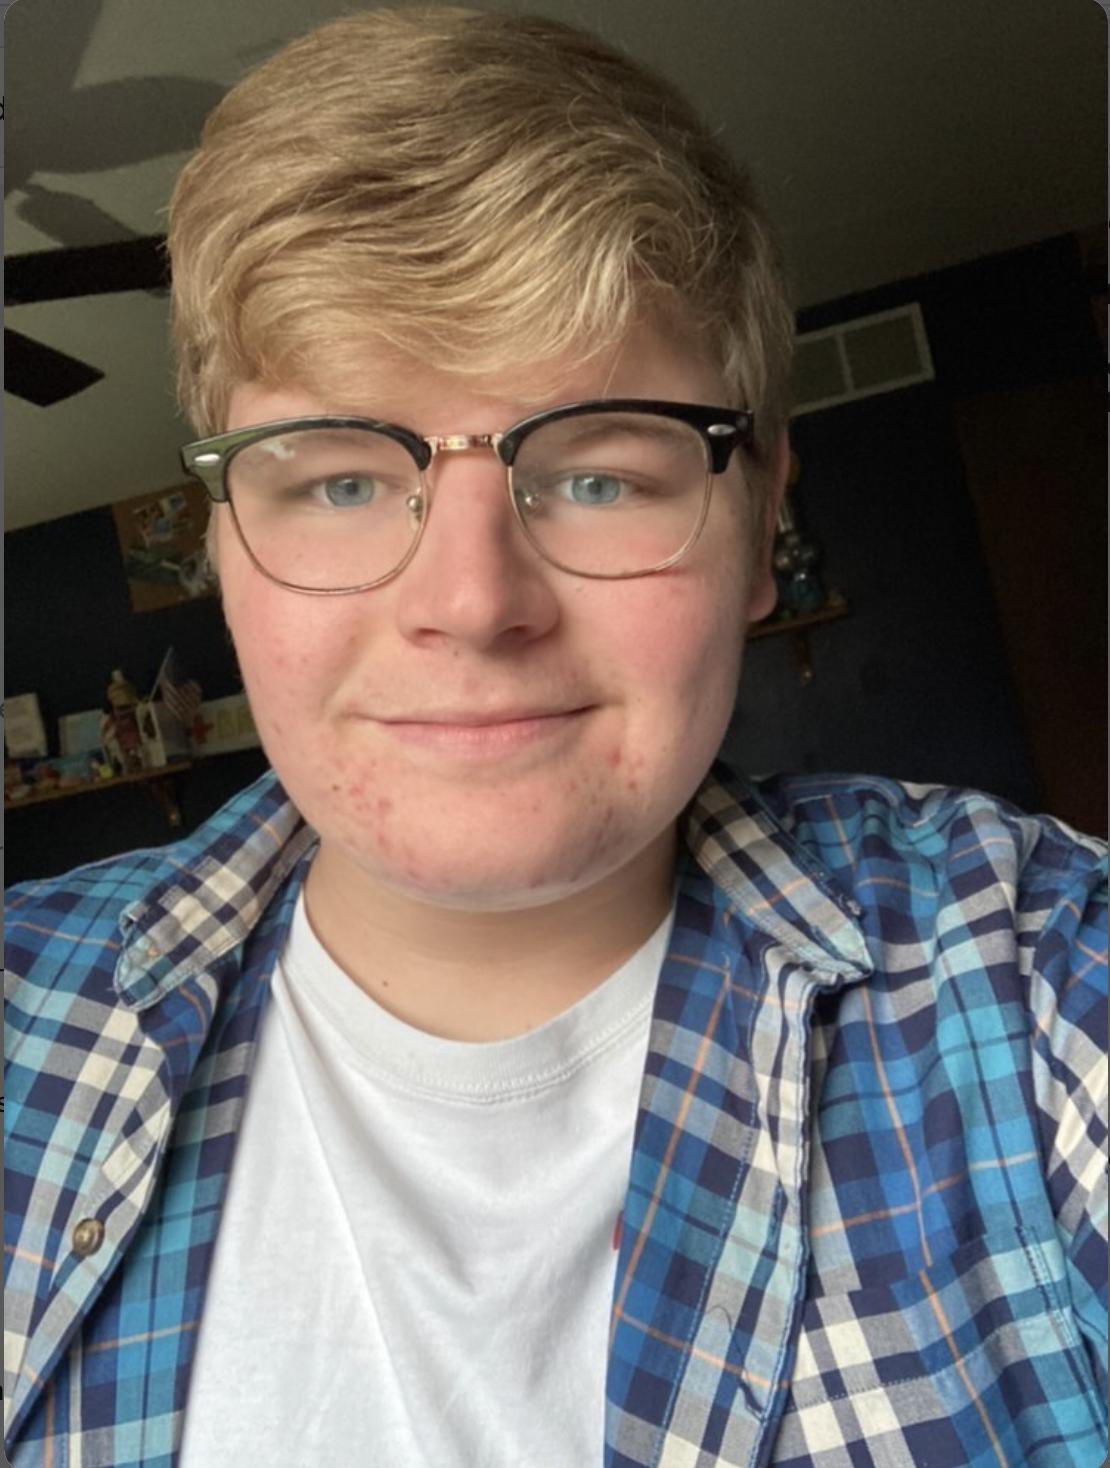 Jacob Young, senior